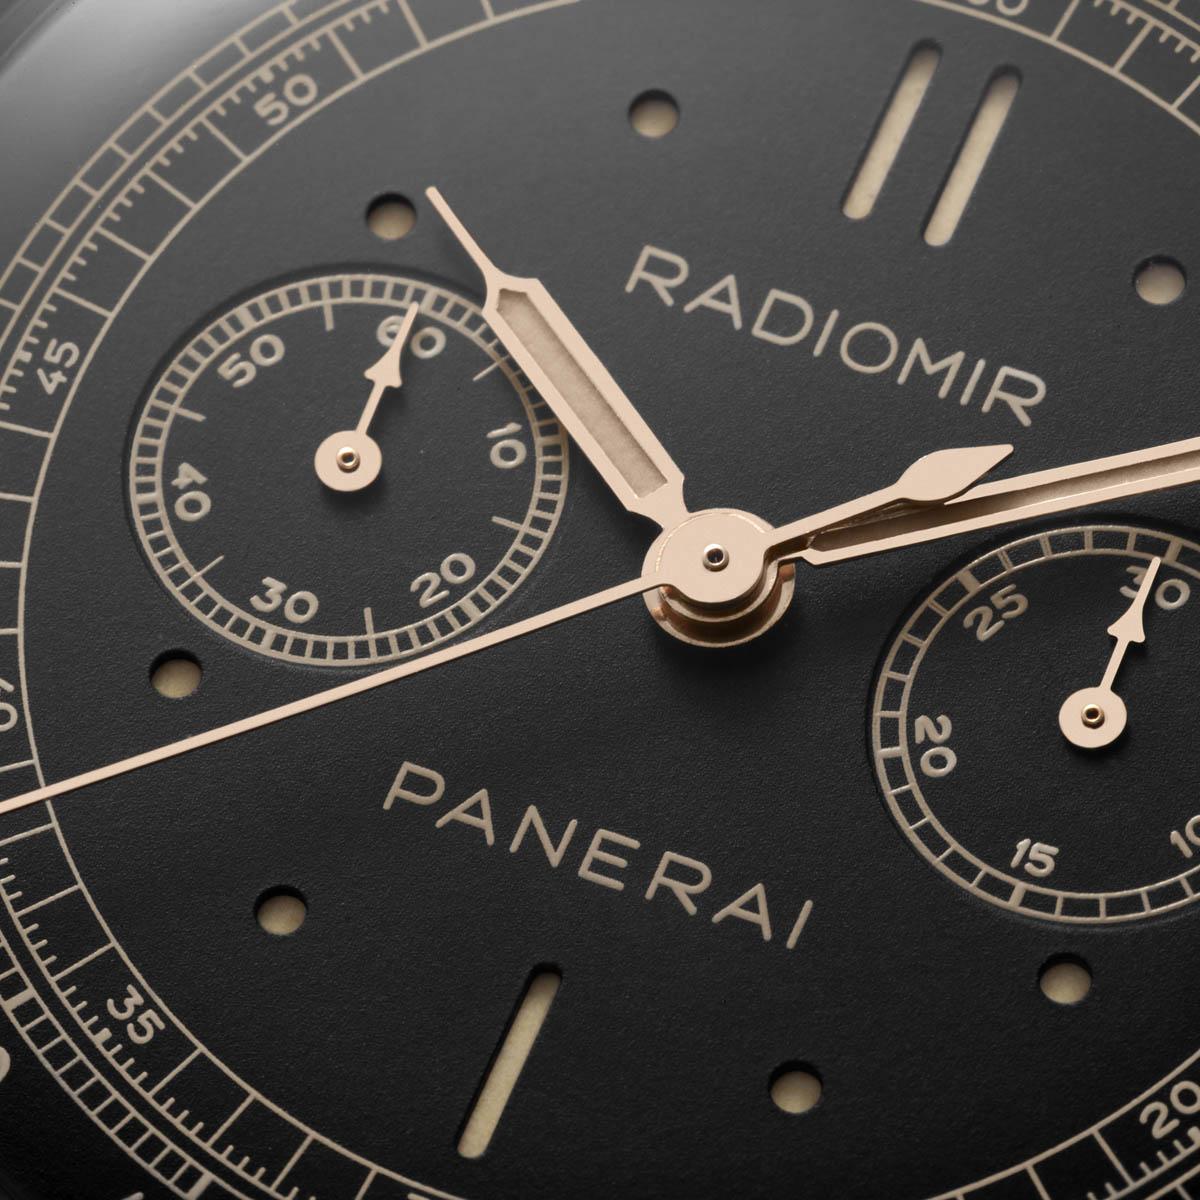 La Cote des Montres : Photo - Panerai Radiomir 1940 Chronograph - 45mm